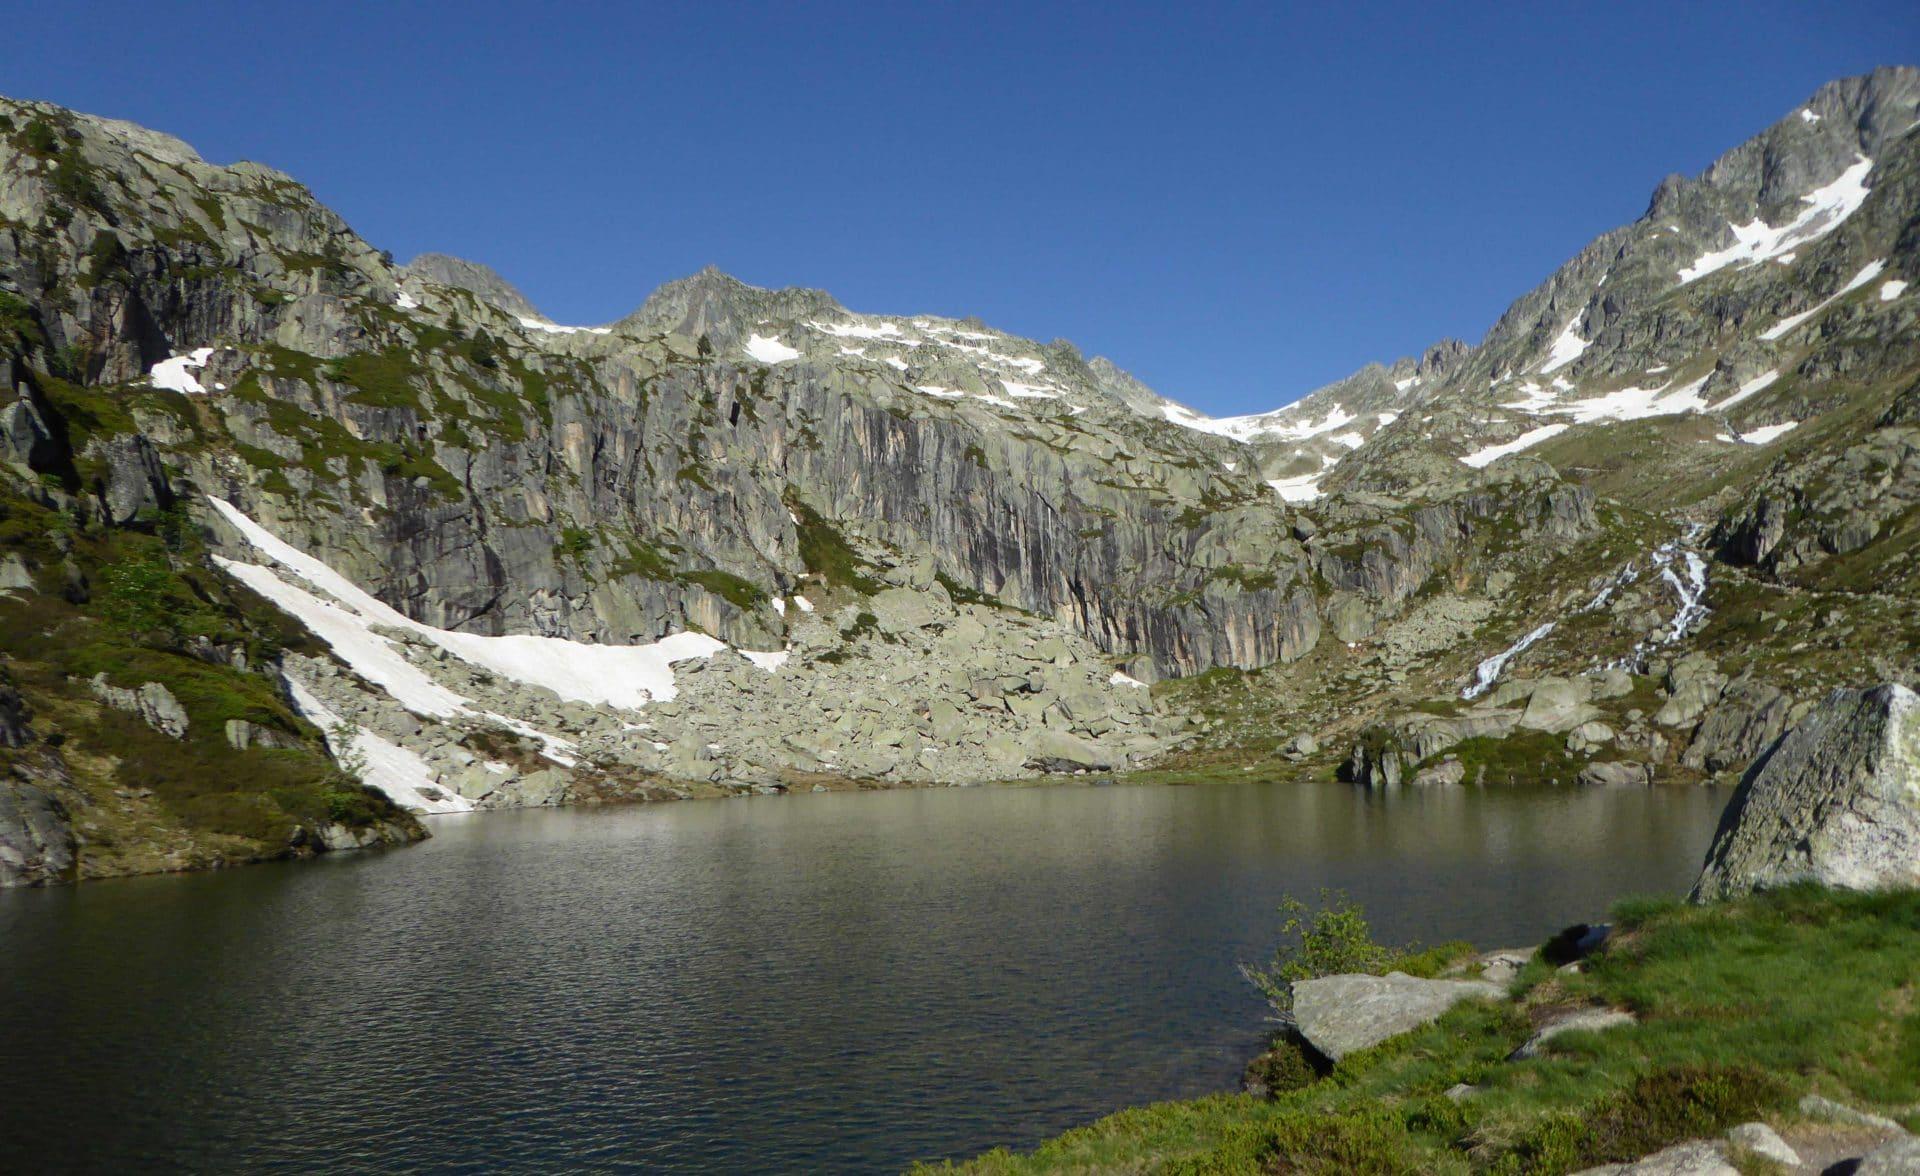 Le lac supérieur de l'Embarrat